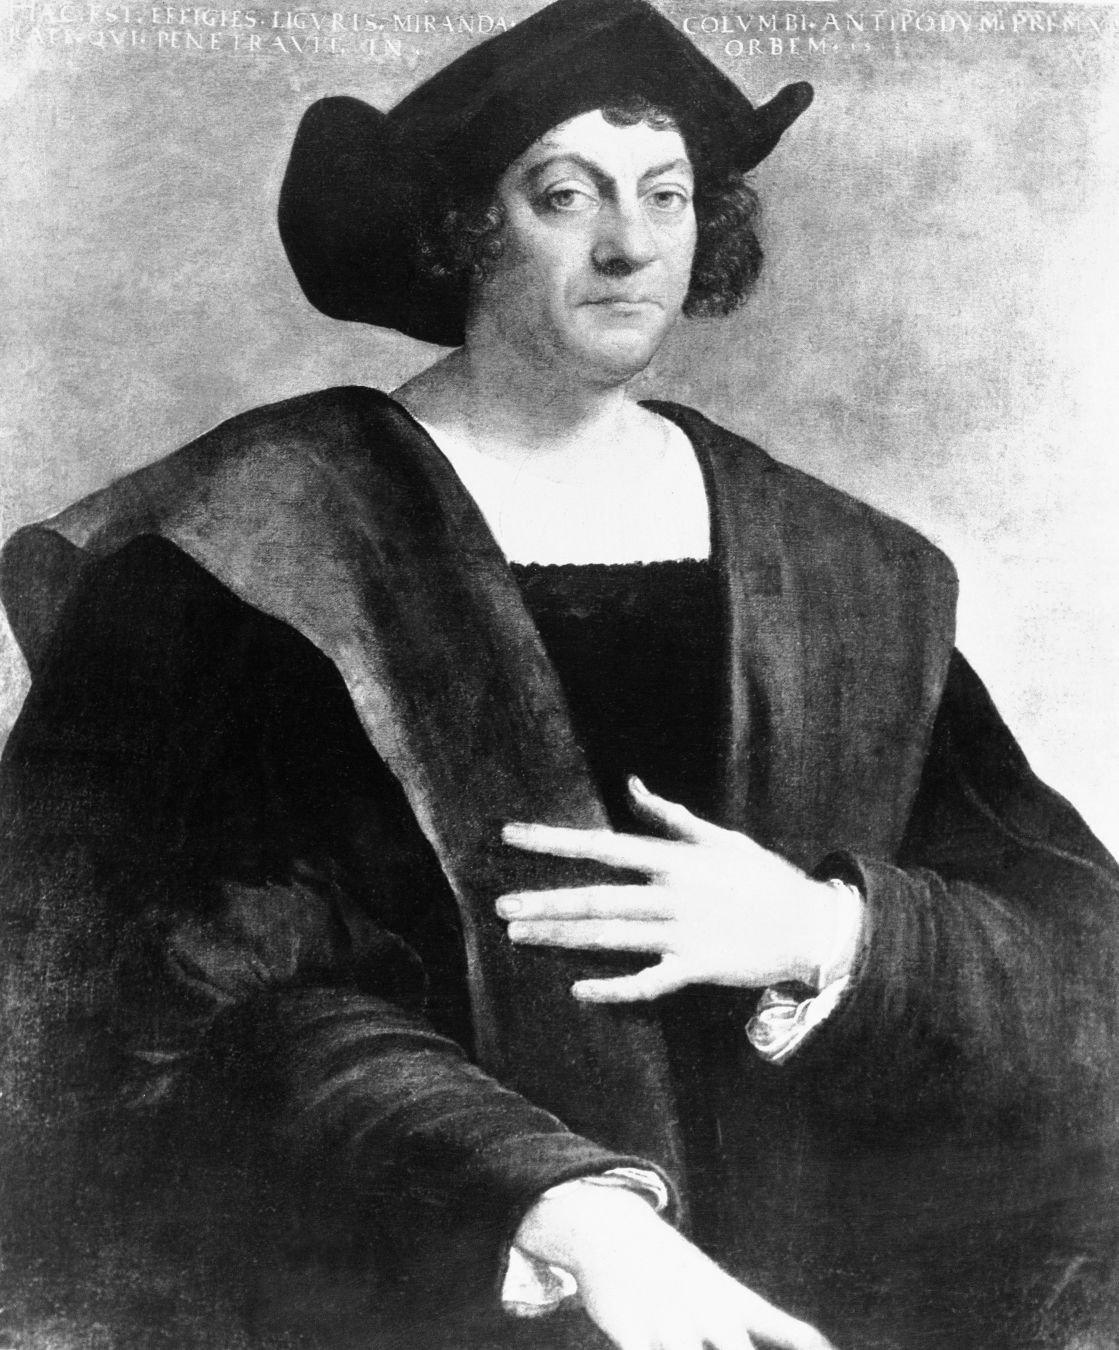 1498: Christopher Columbus